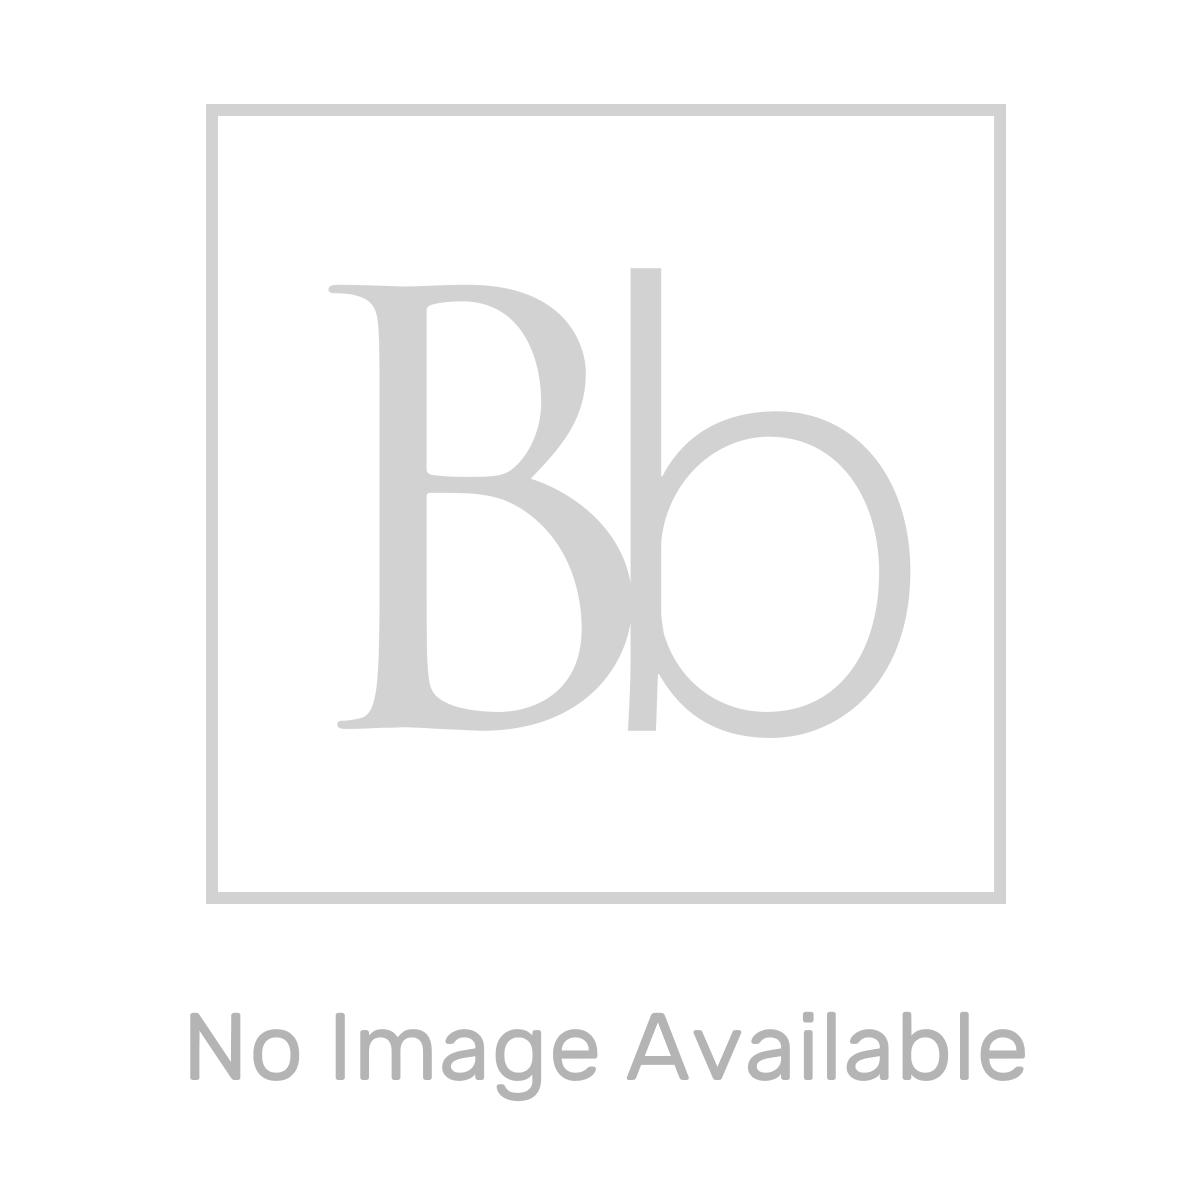 Triton Aspirante Black Gloss Electric Shower in Situation